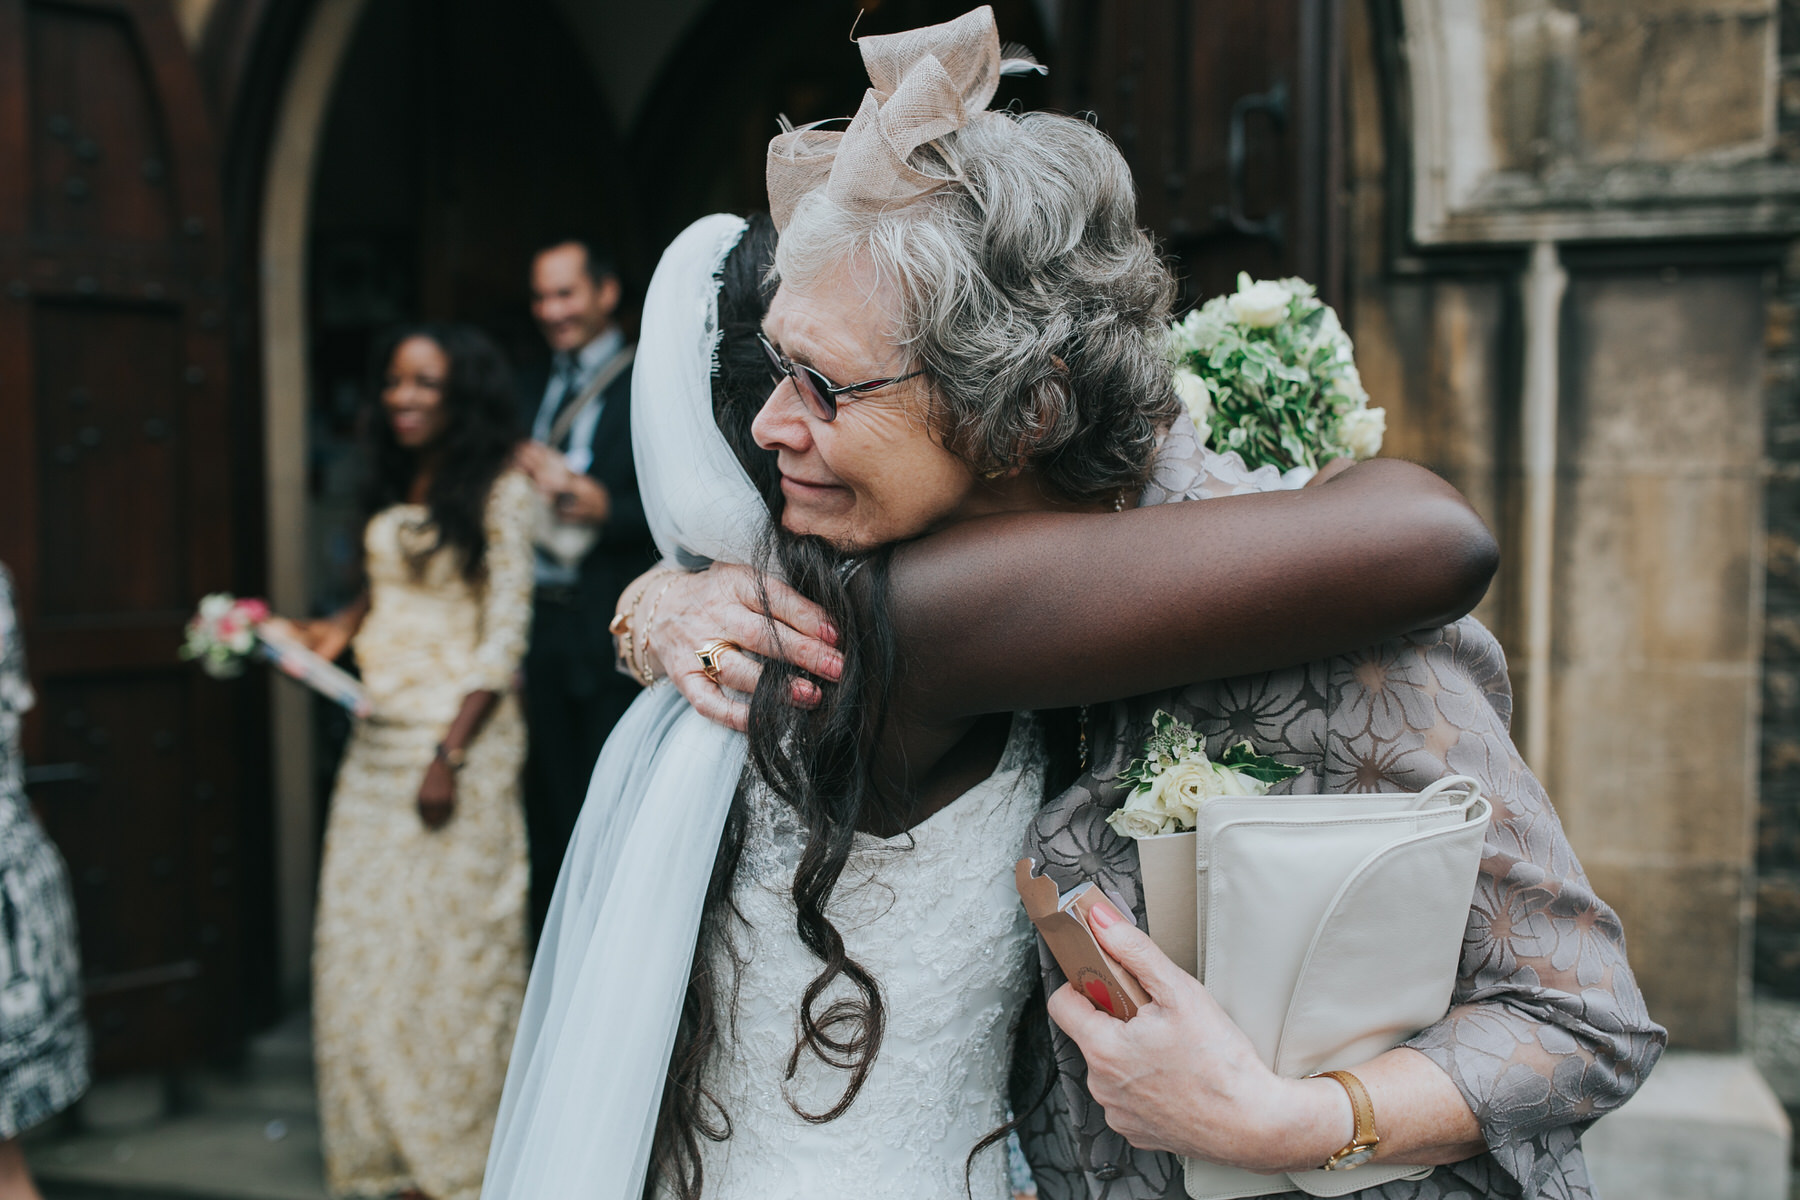 97 bride hugging mother in law documentary wedding image.jpg